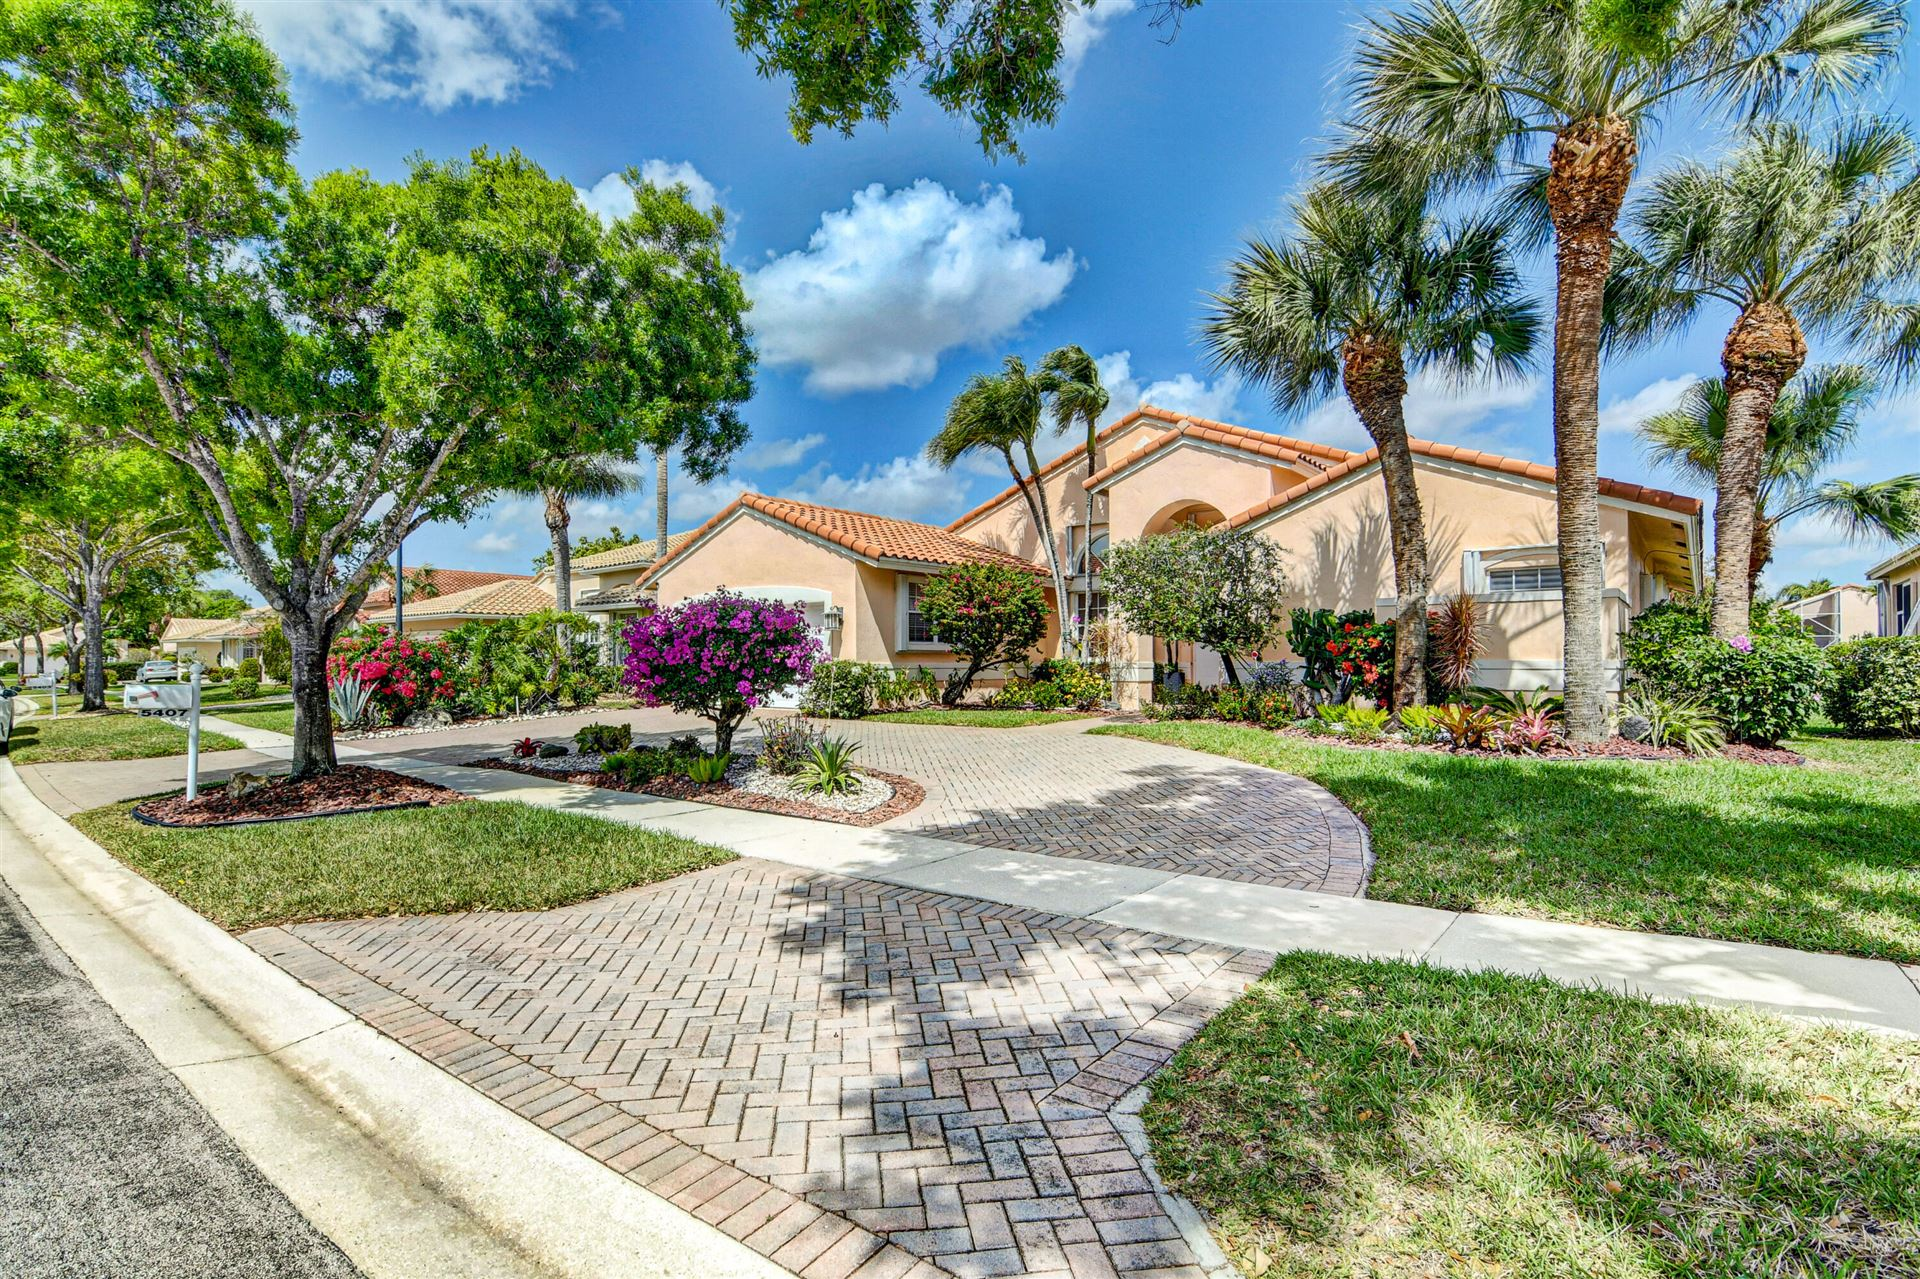 5407 Landon Circle, Boynton Beach, FL 33437 - MLS#: RX-10704546